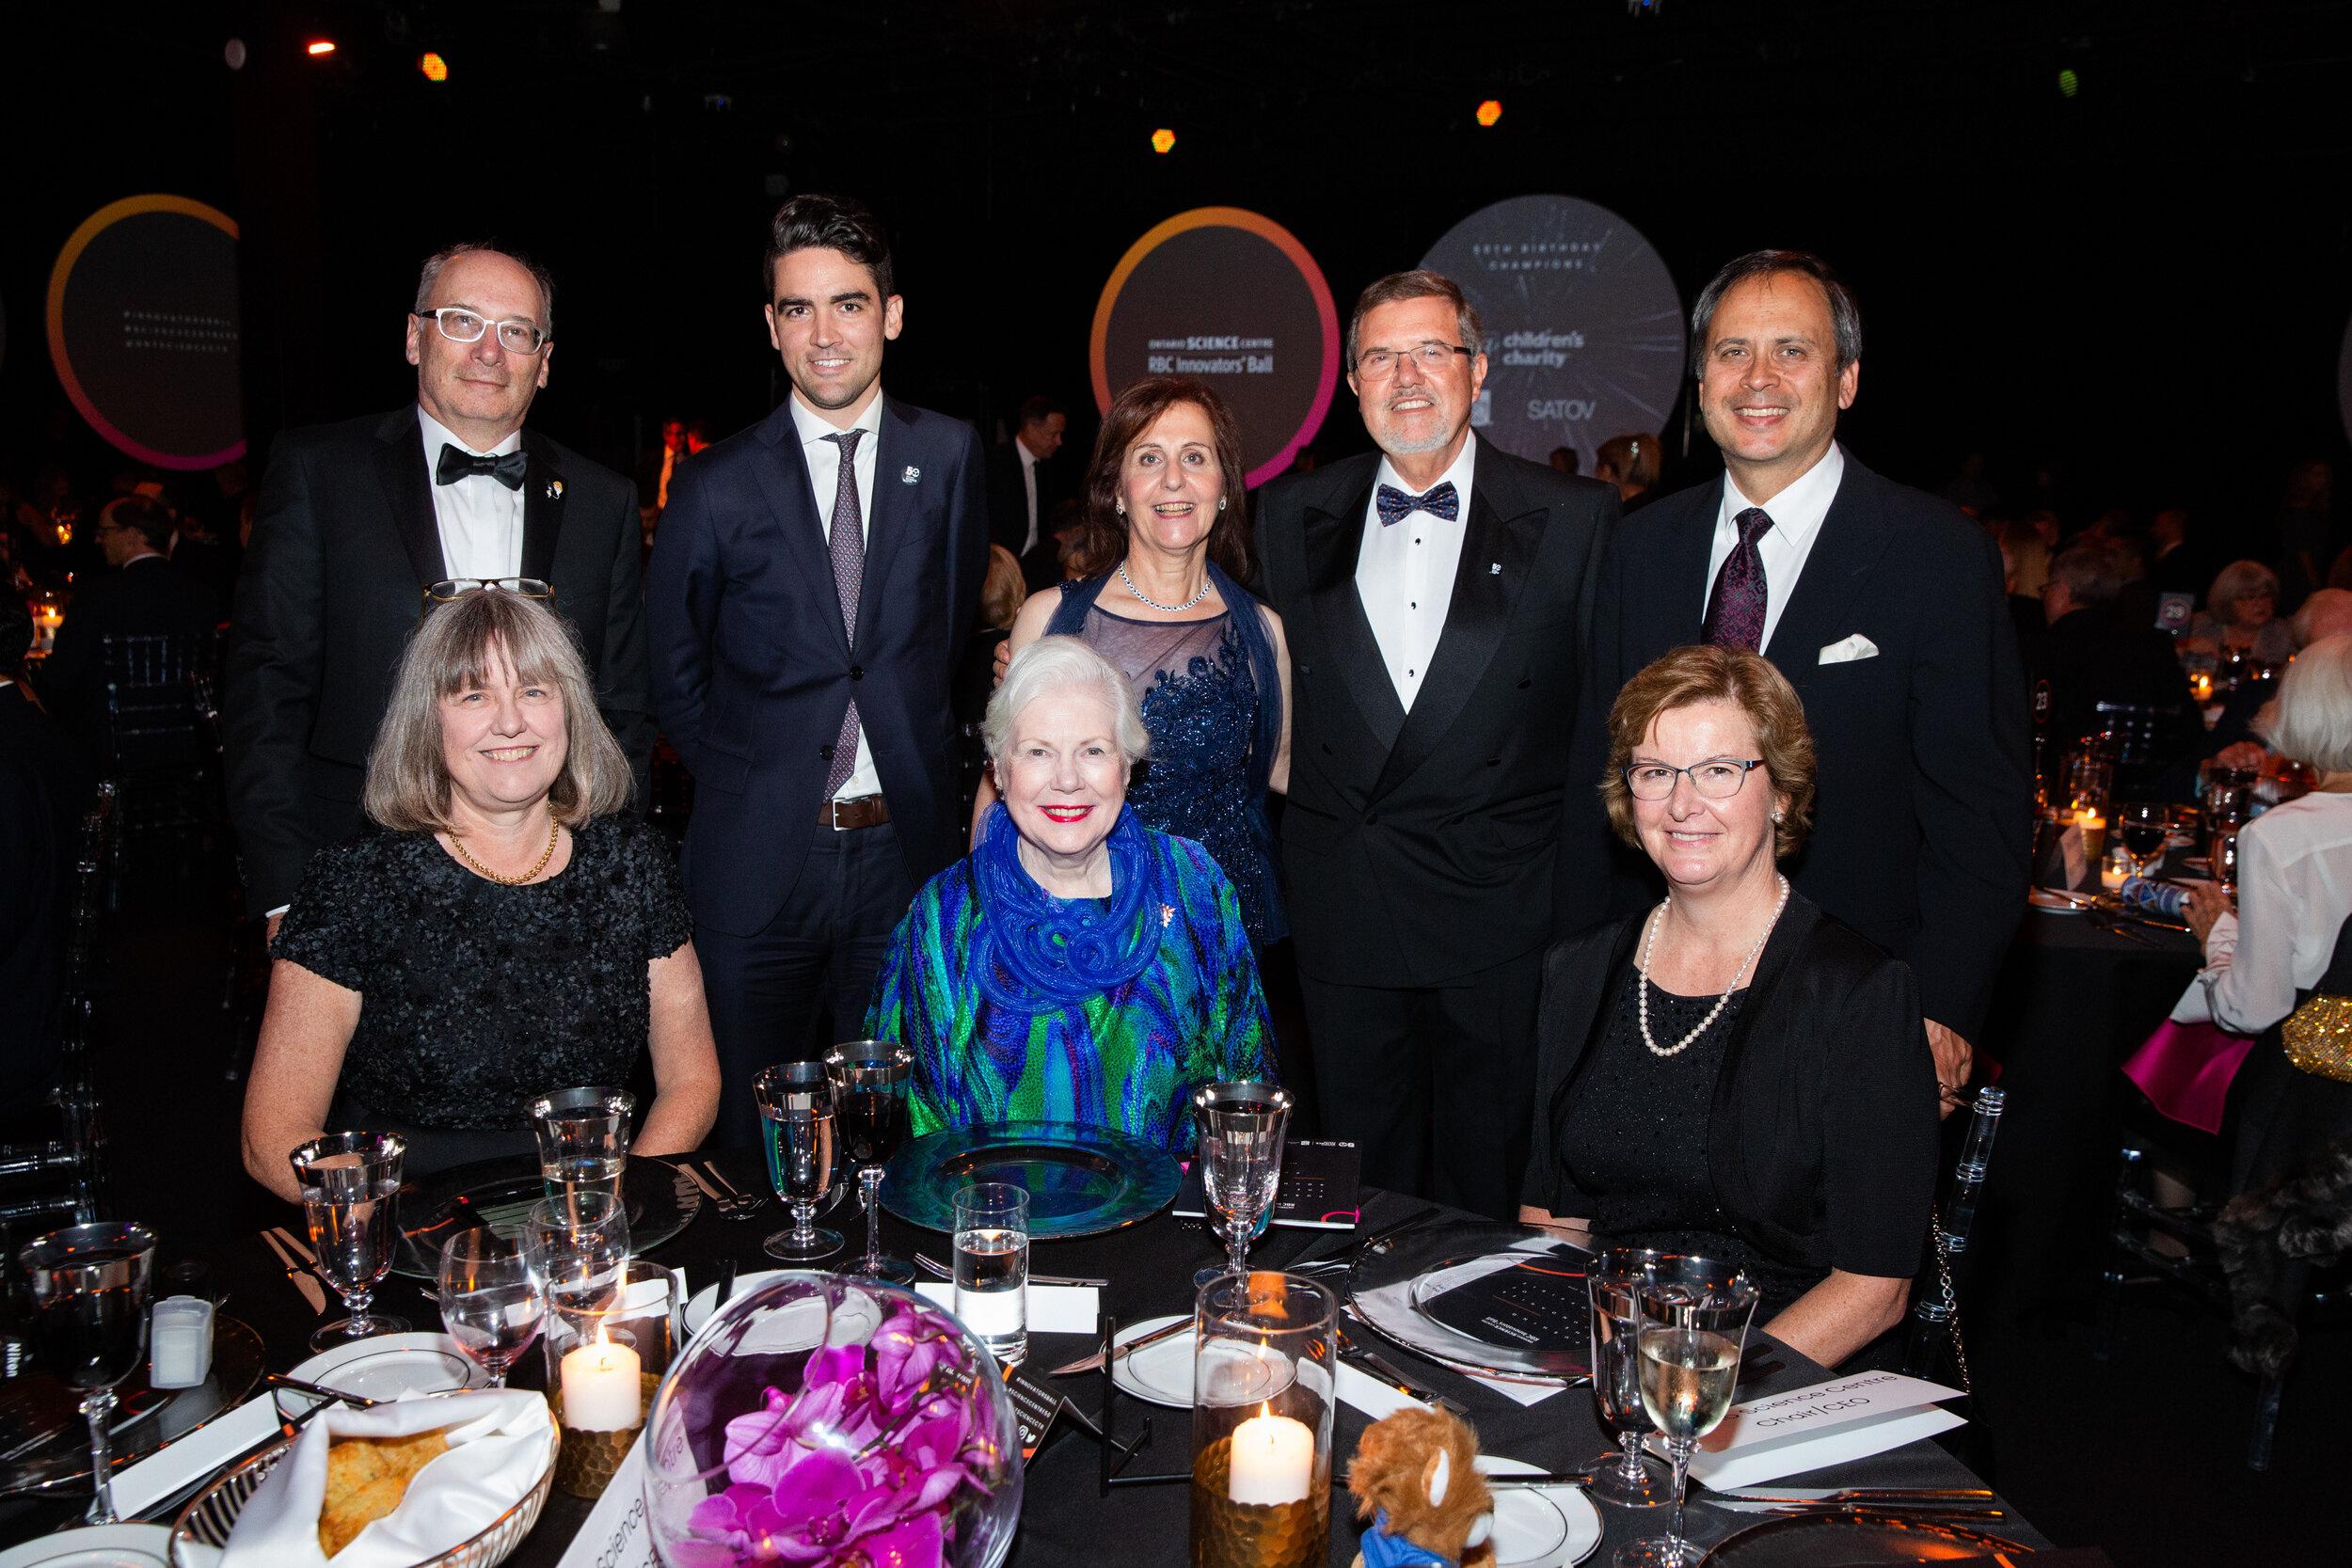 Ontario Science Centre Chair/CEO